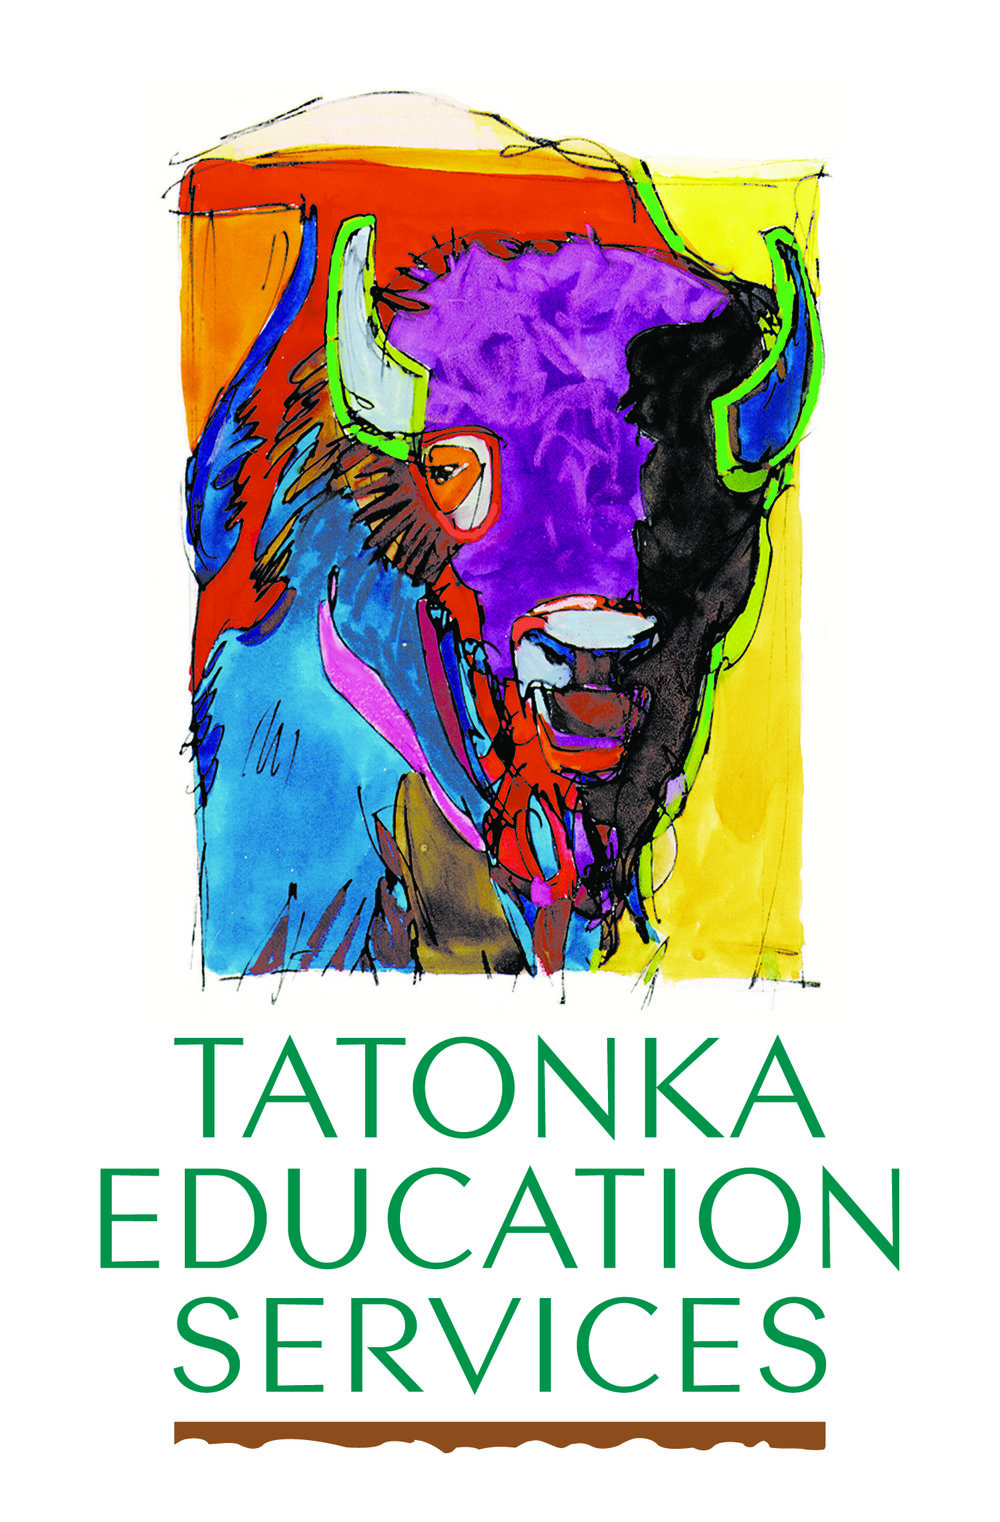 TatonkaEducationServices_logo_FullColor.jpg